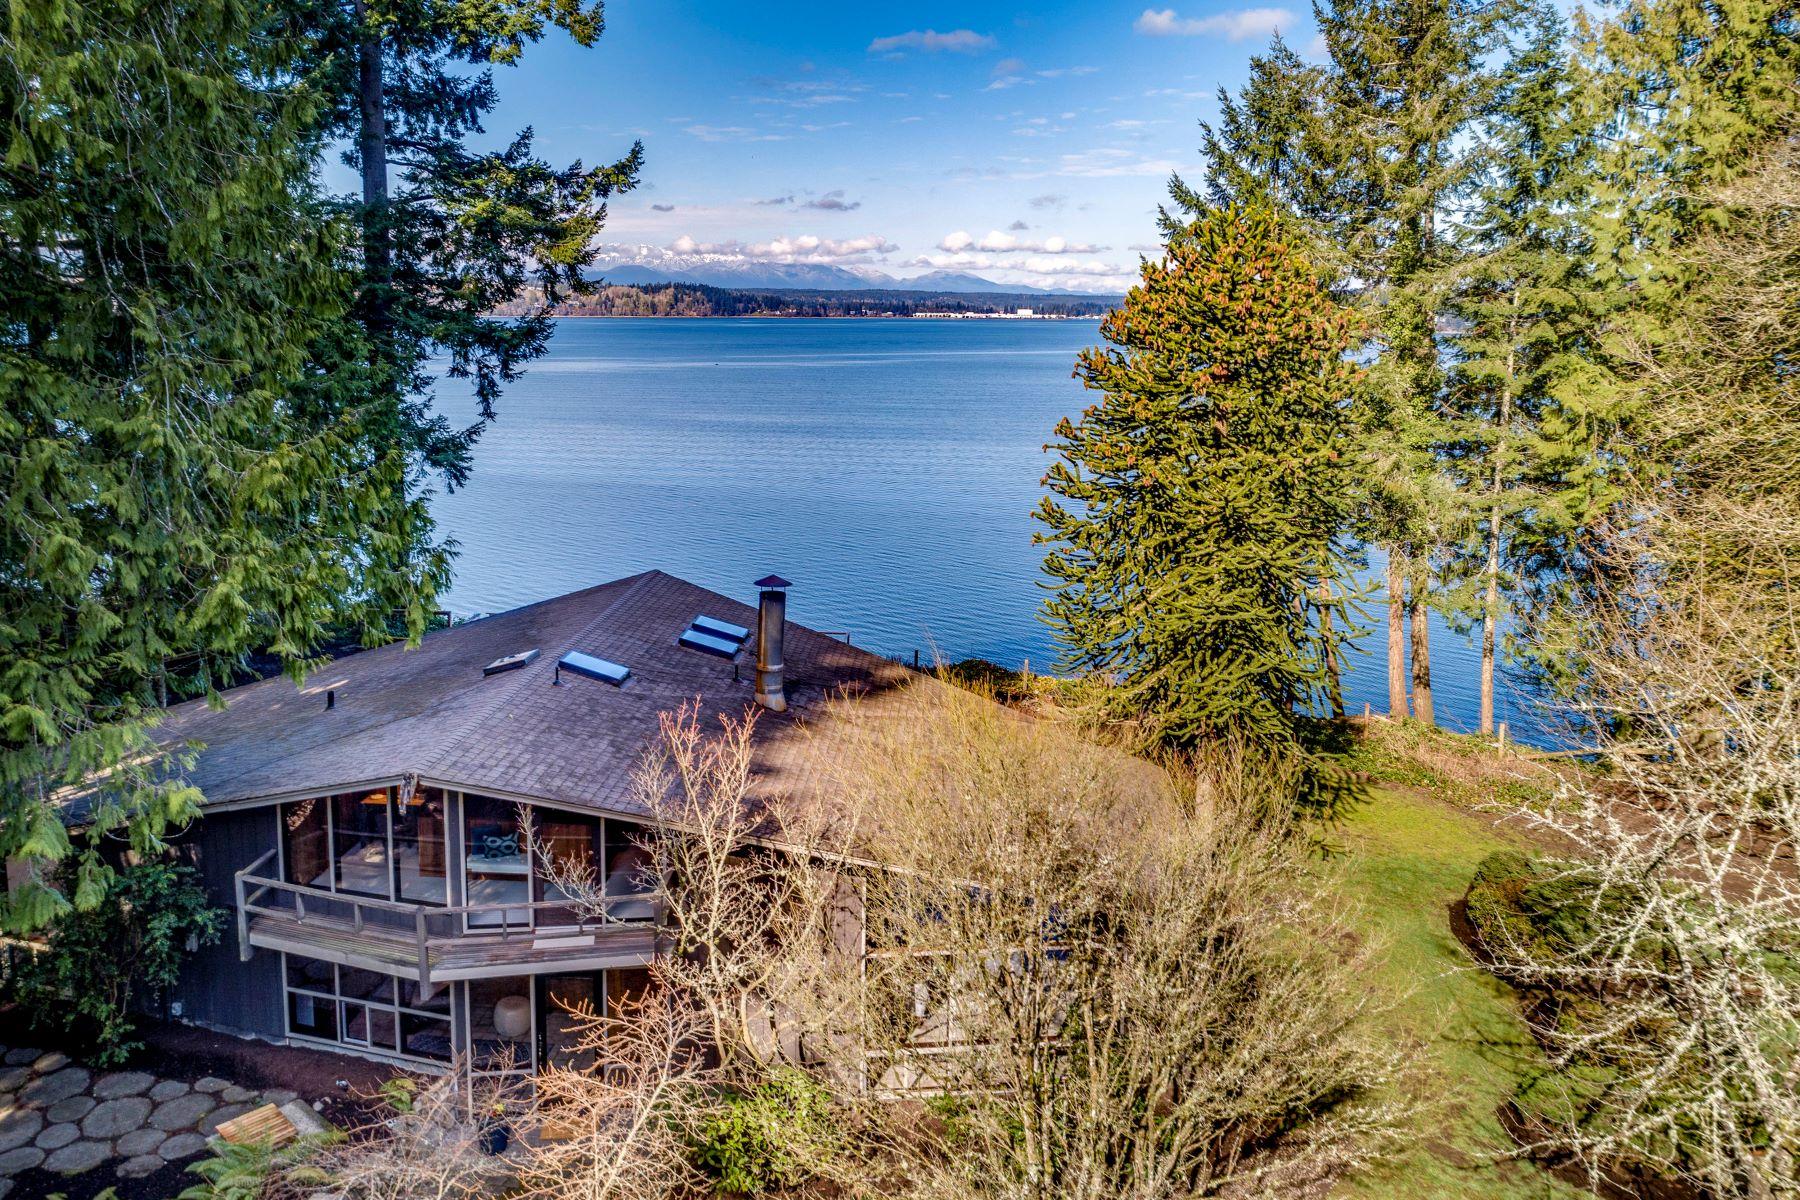 Single Family Homes for Sale at 12169 Arrow Point Loop NE, Bainbridge Island, WA 98110 12169 Arrow Point Loop NE Bainbridge Island, Washington 98110 United States